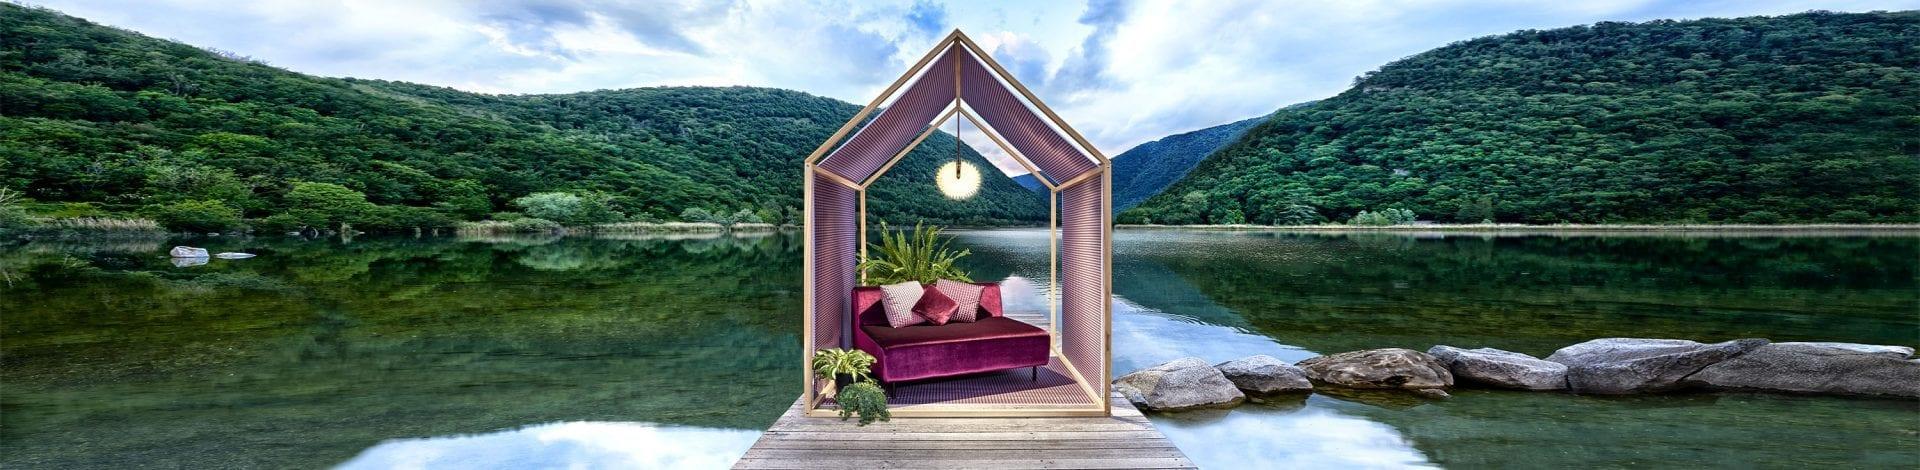 eco-friendly furnishing fabrics